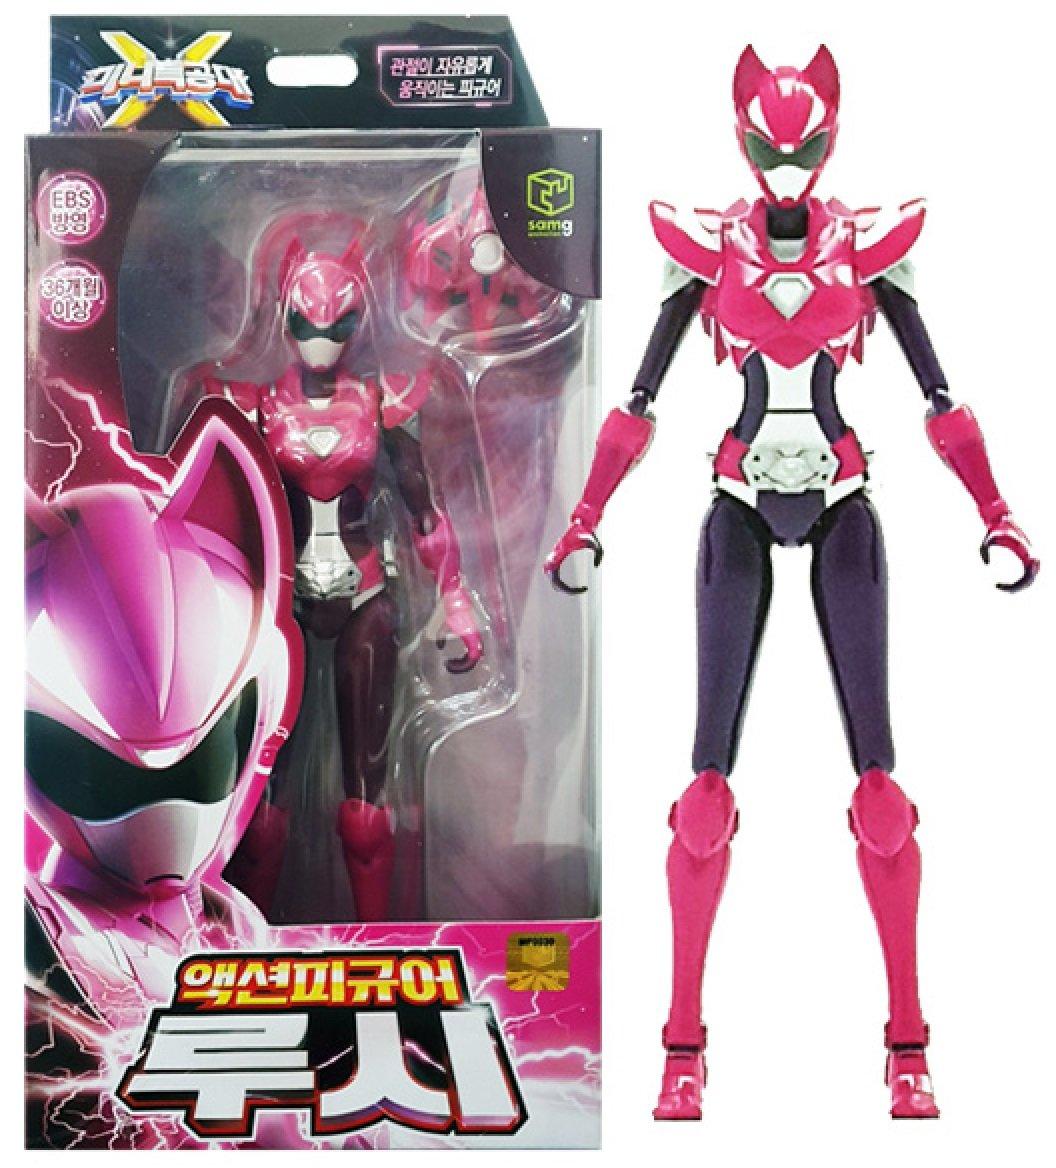 MINI FORCE 2018 New Version Miniforce X Lucy Korean Robot Action Figure Pink 6.9 Joints Move Gaia